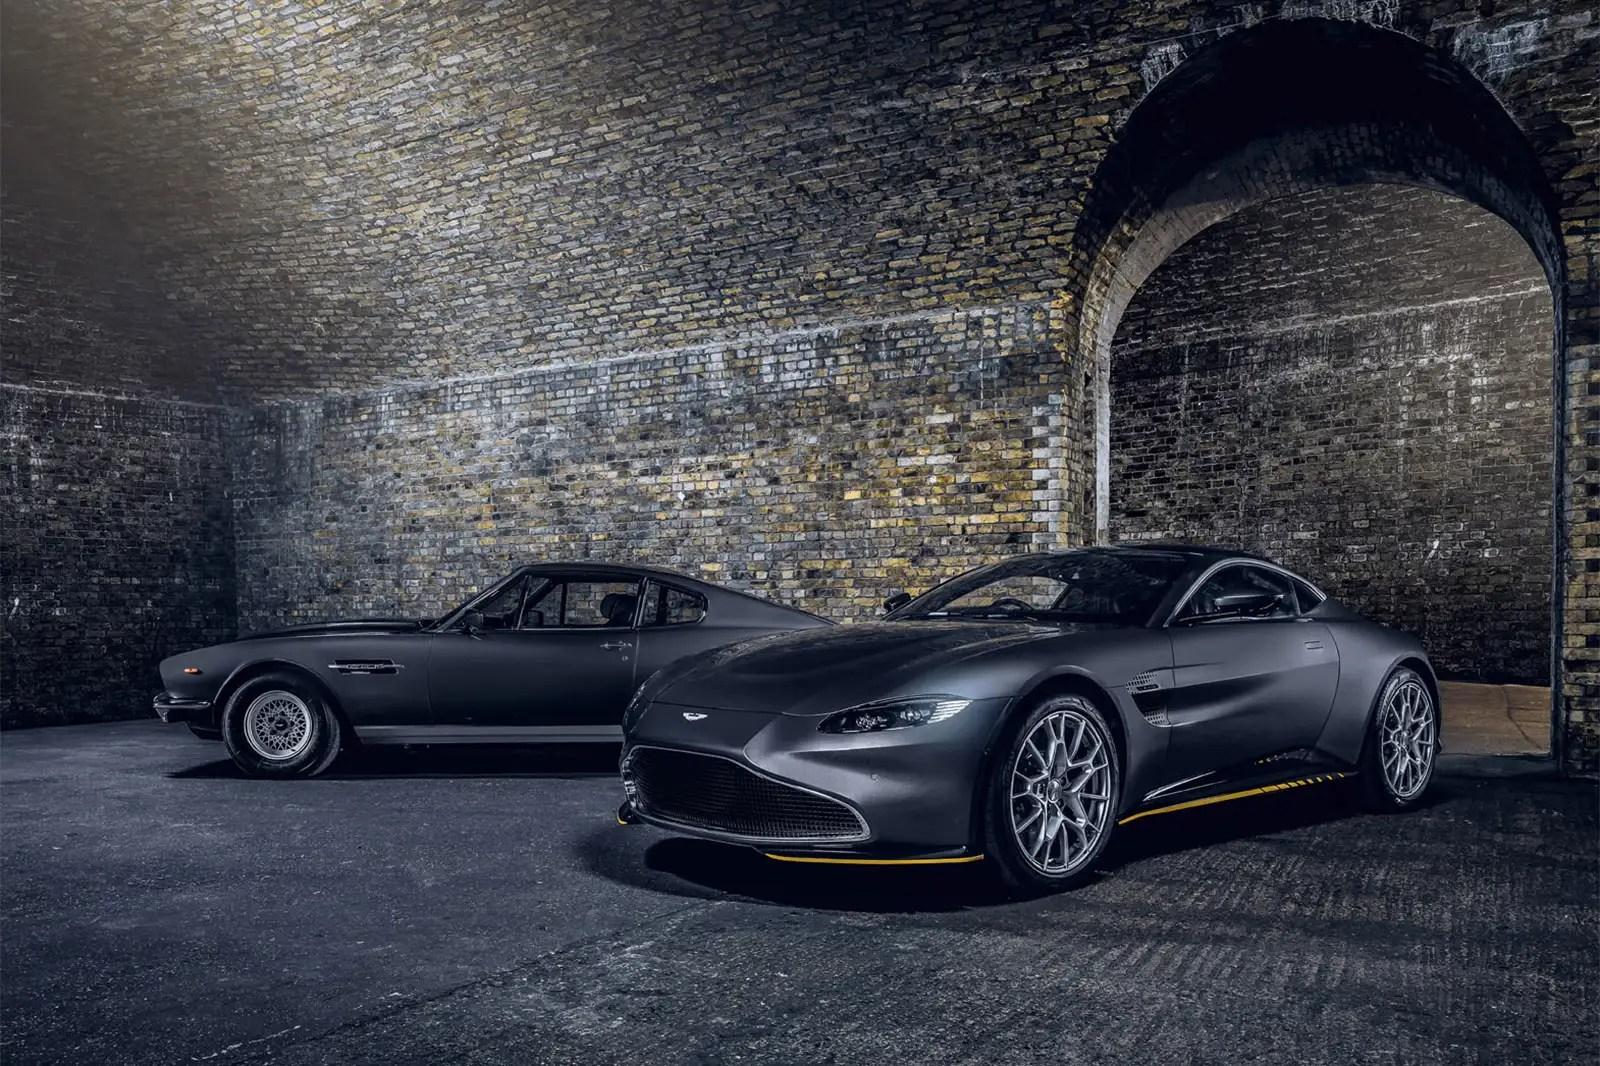 Stunning red bull aston martin f1 car in action. Aston Martin 007 Edition Models Celebrate New James Bond Film Autocar